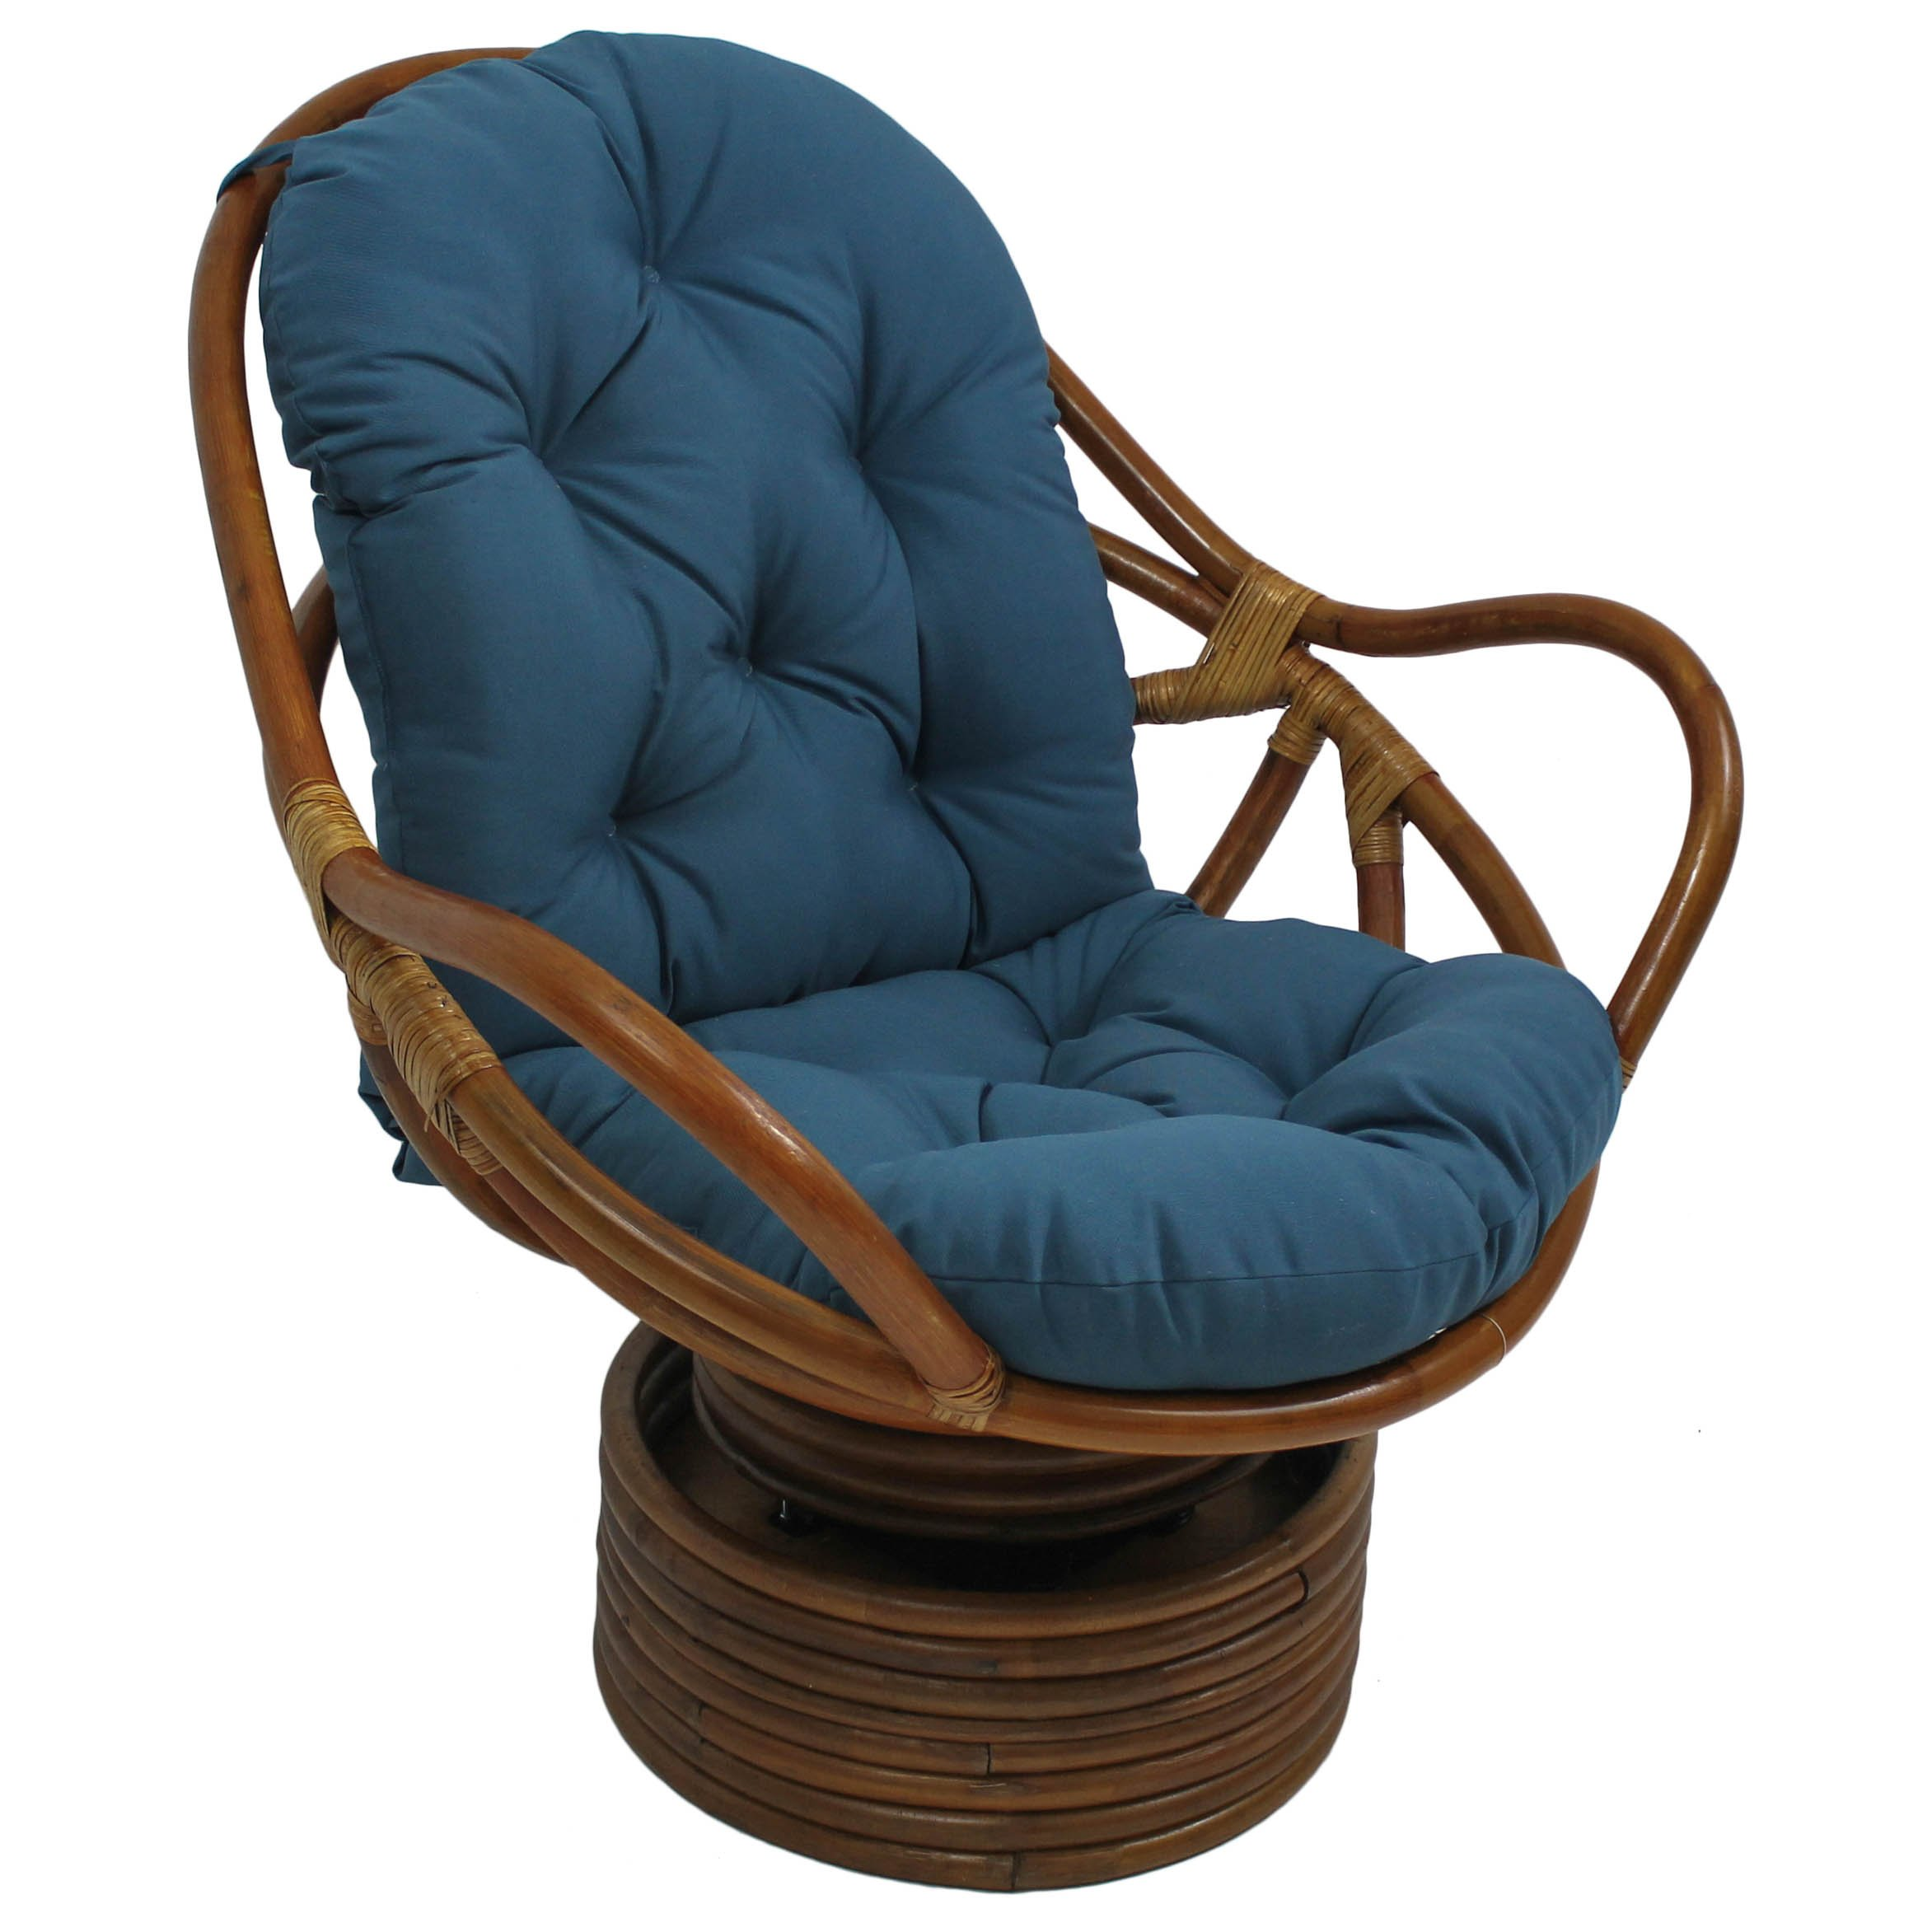 Blazing Needles Solid Twill Swivel Rocker Chair Cushion, 48'' x 24'', Indigo